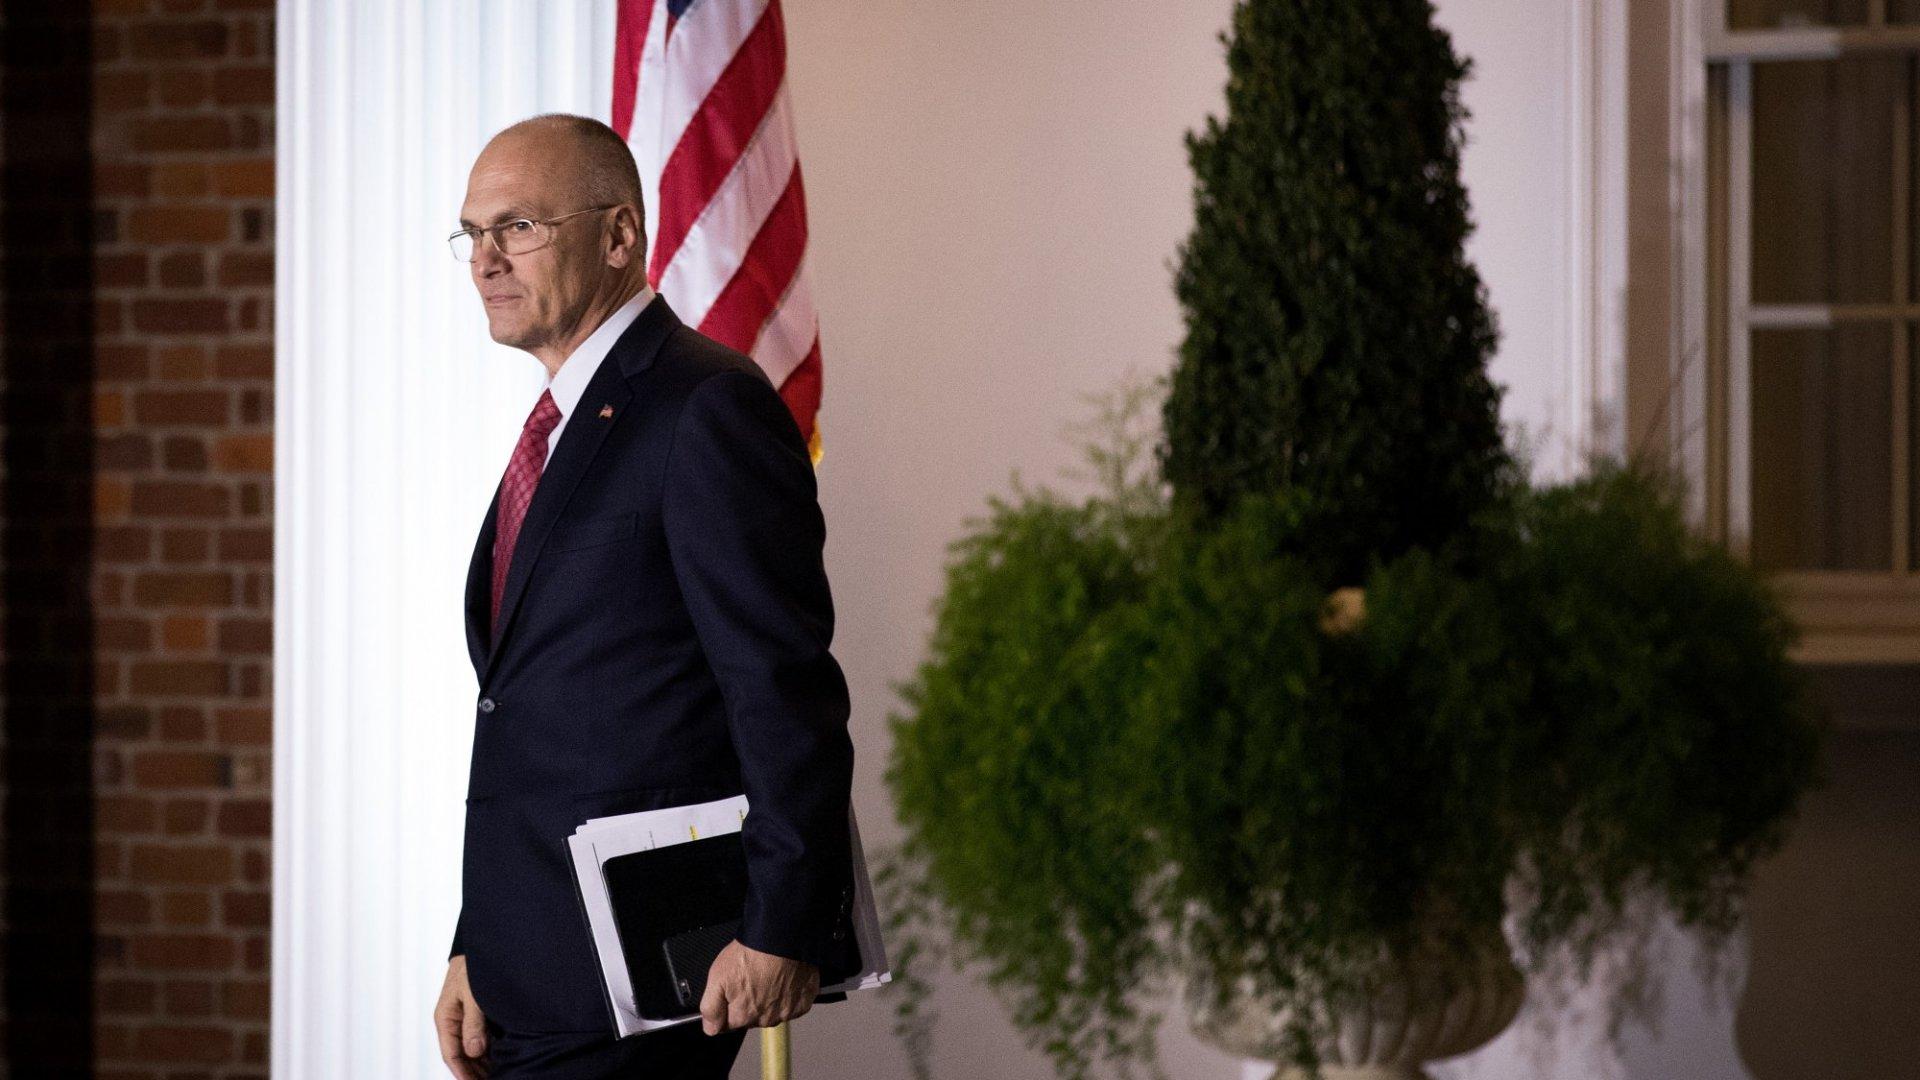 Andrew Puzder Withdraws Nomination as Trump's Labor Secretary